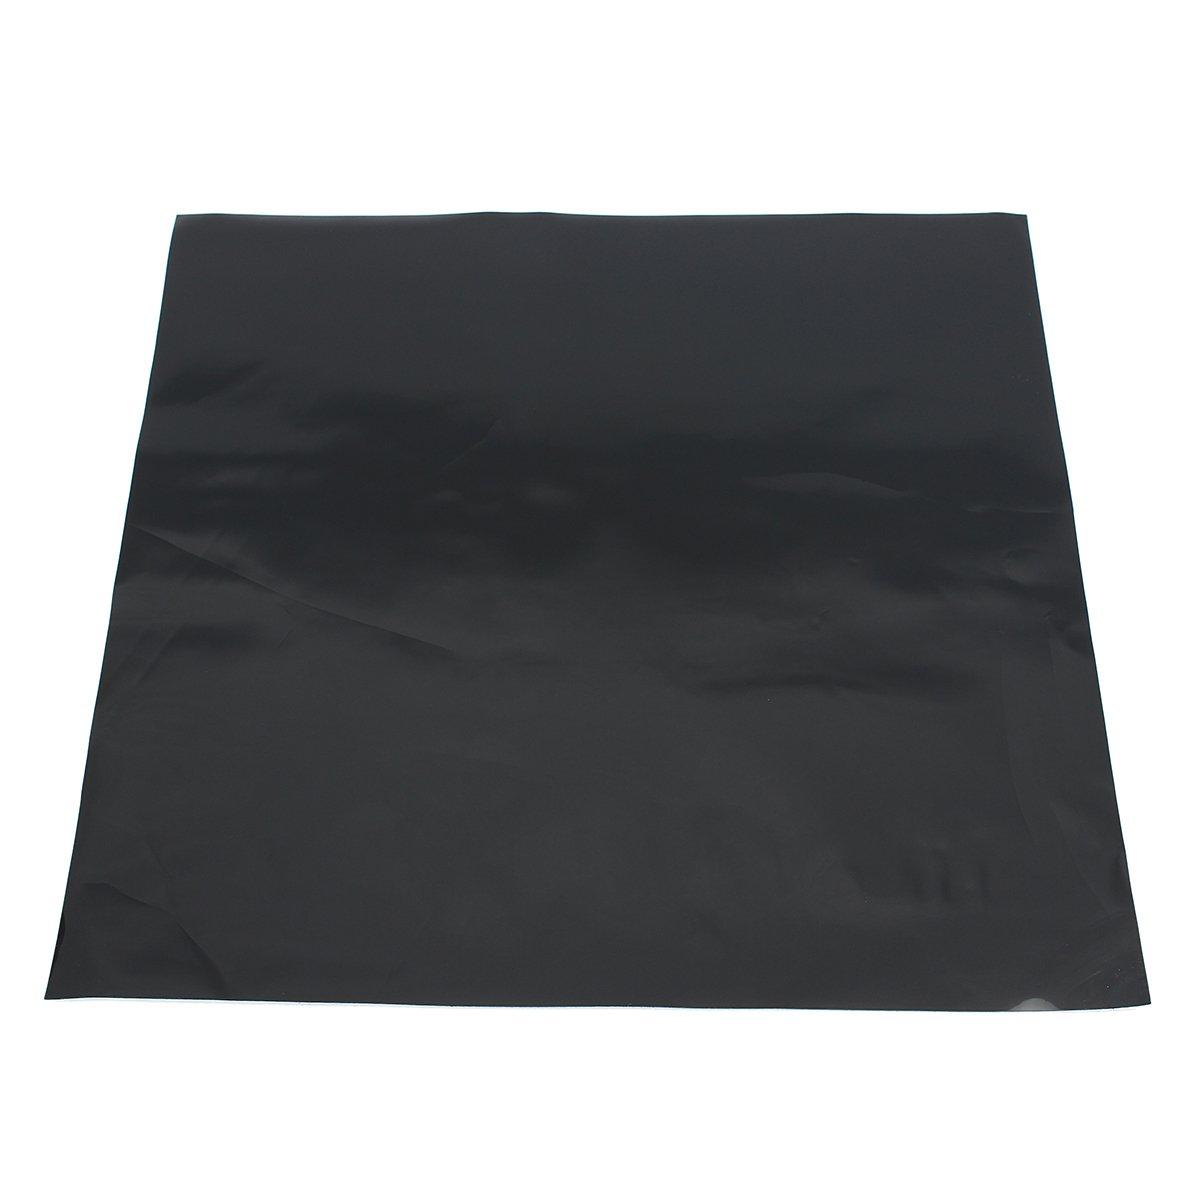 QOJA 300x300x0.6mm black silicone rubber sheet self adhesive pad